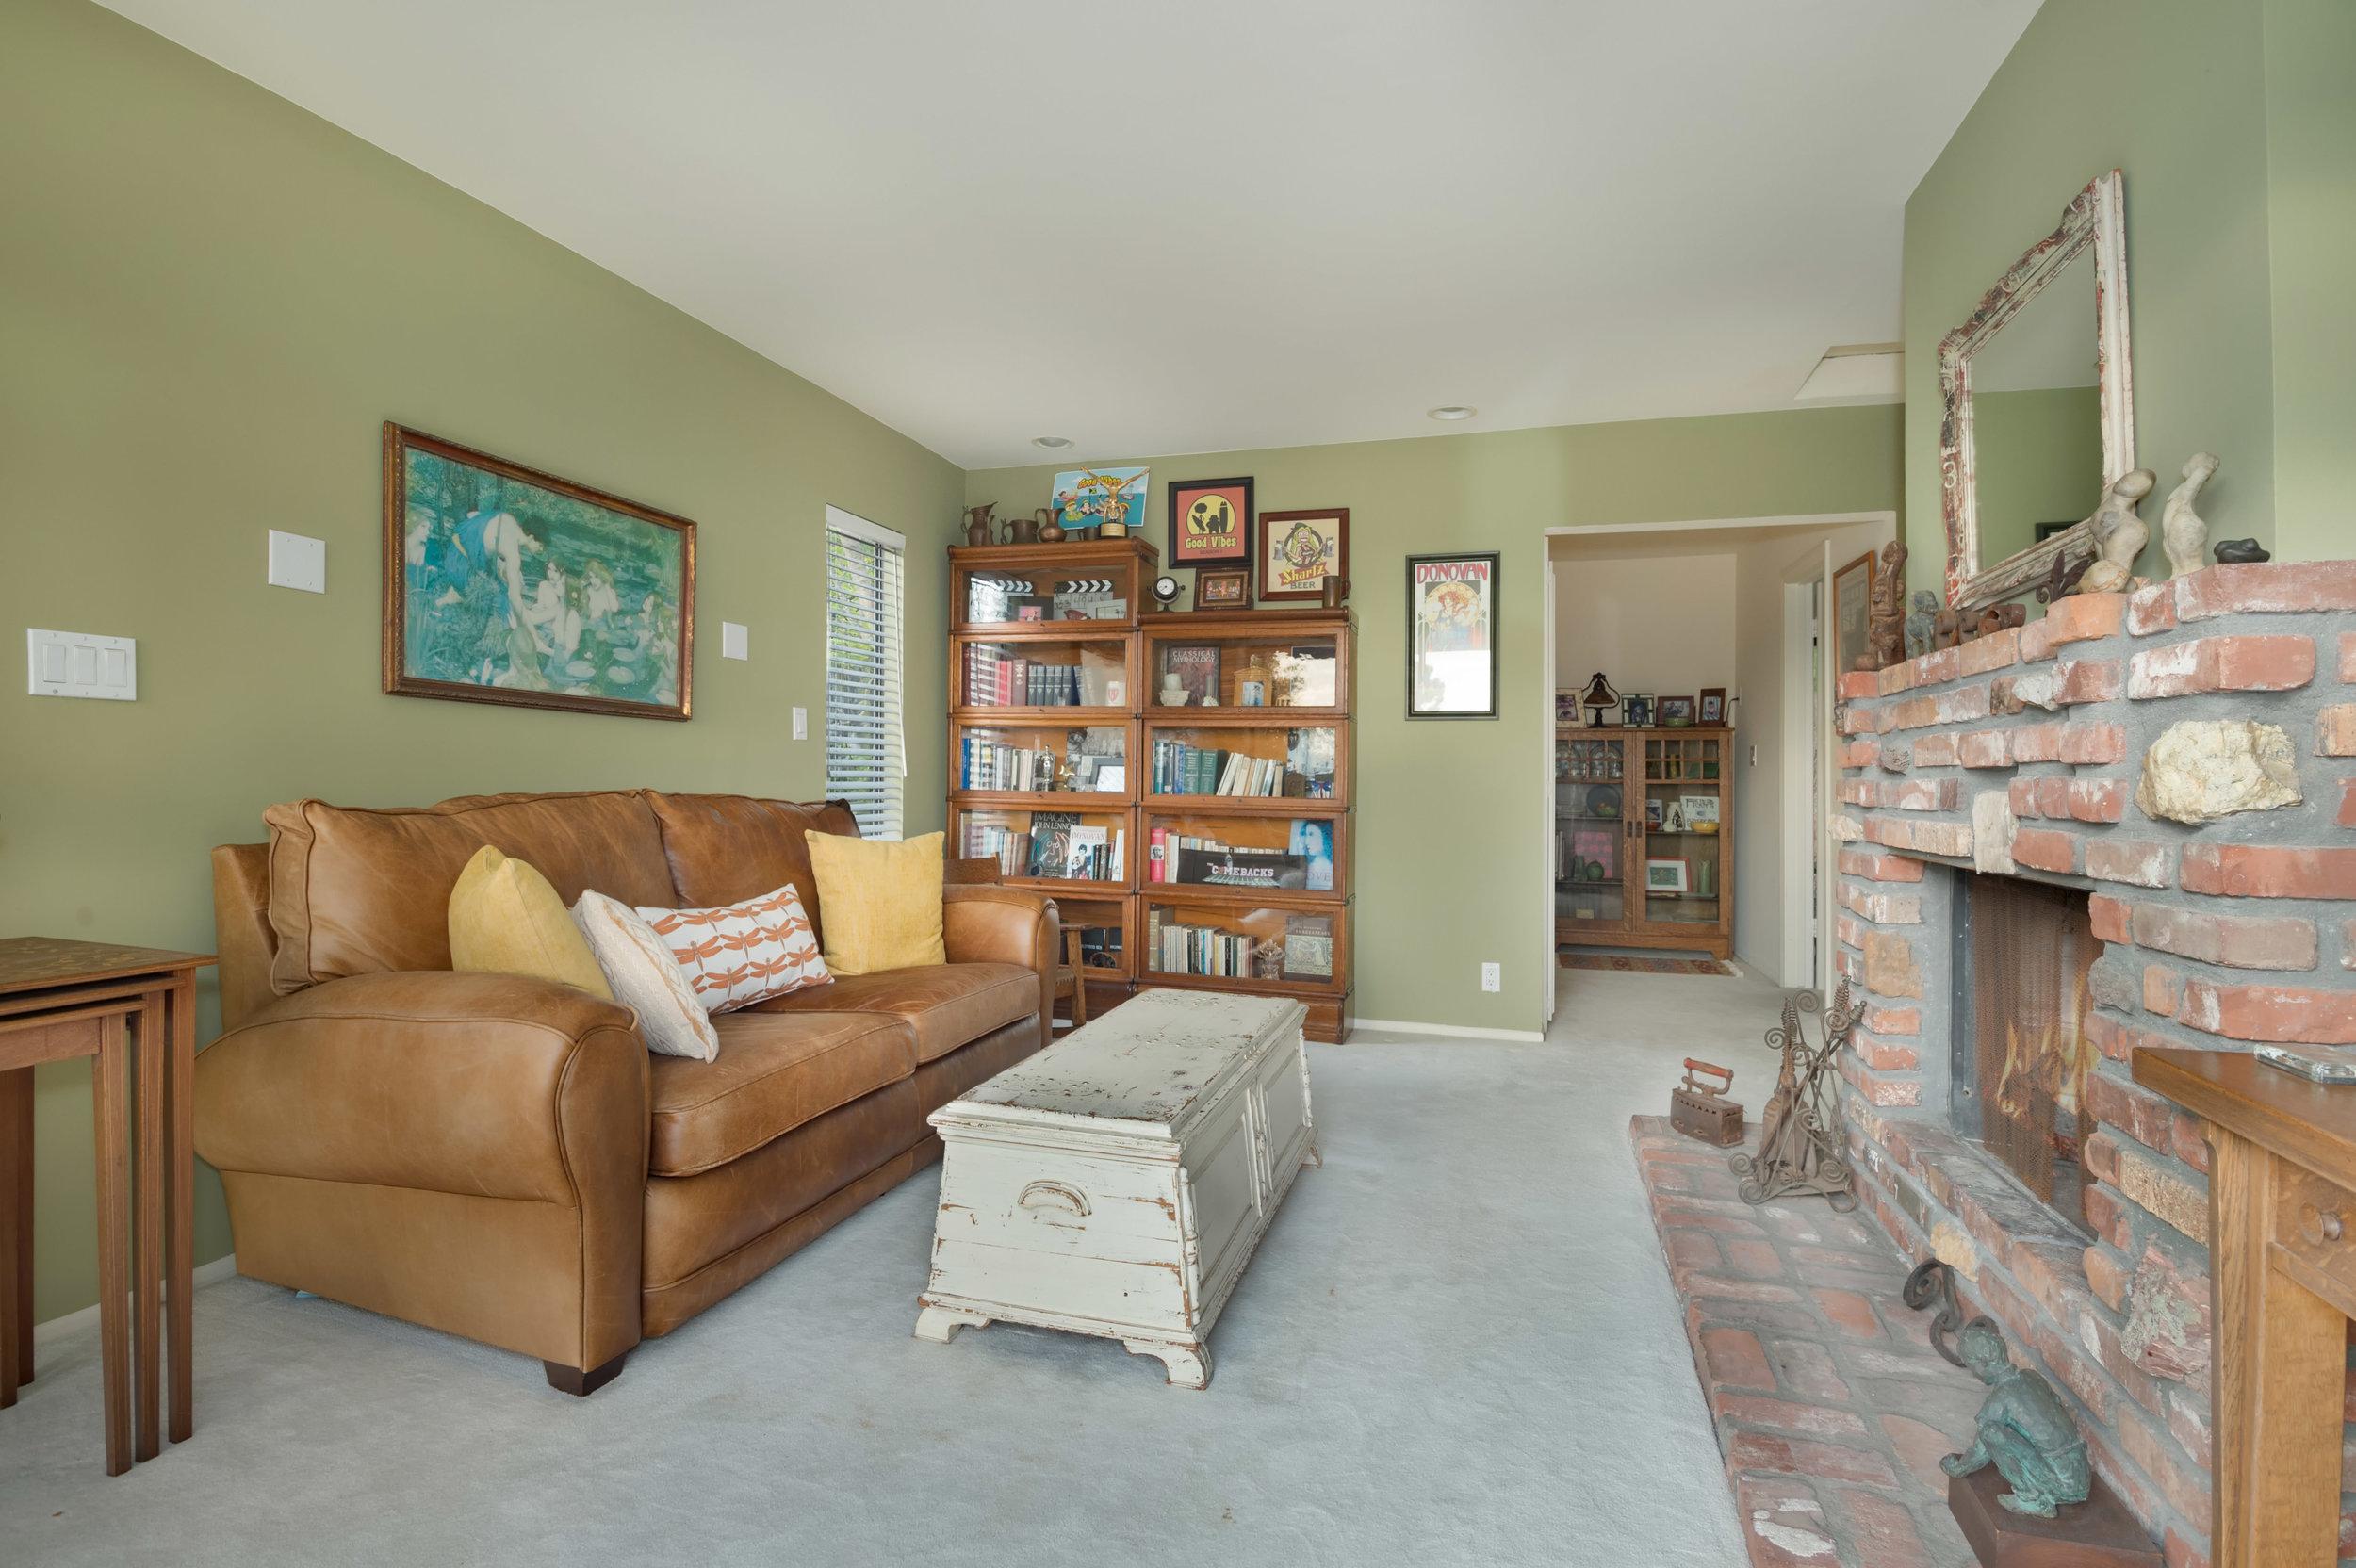 028 guest house 29660 Harvester Road Malibu For Sale The Malibu Life Team Luxury Real Estate.jpg